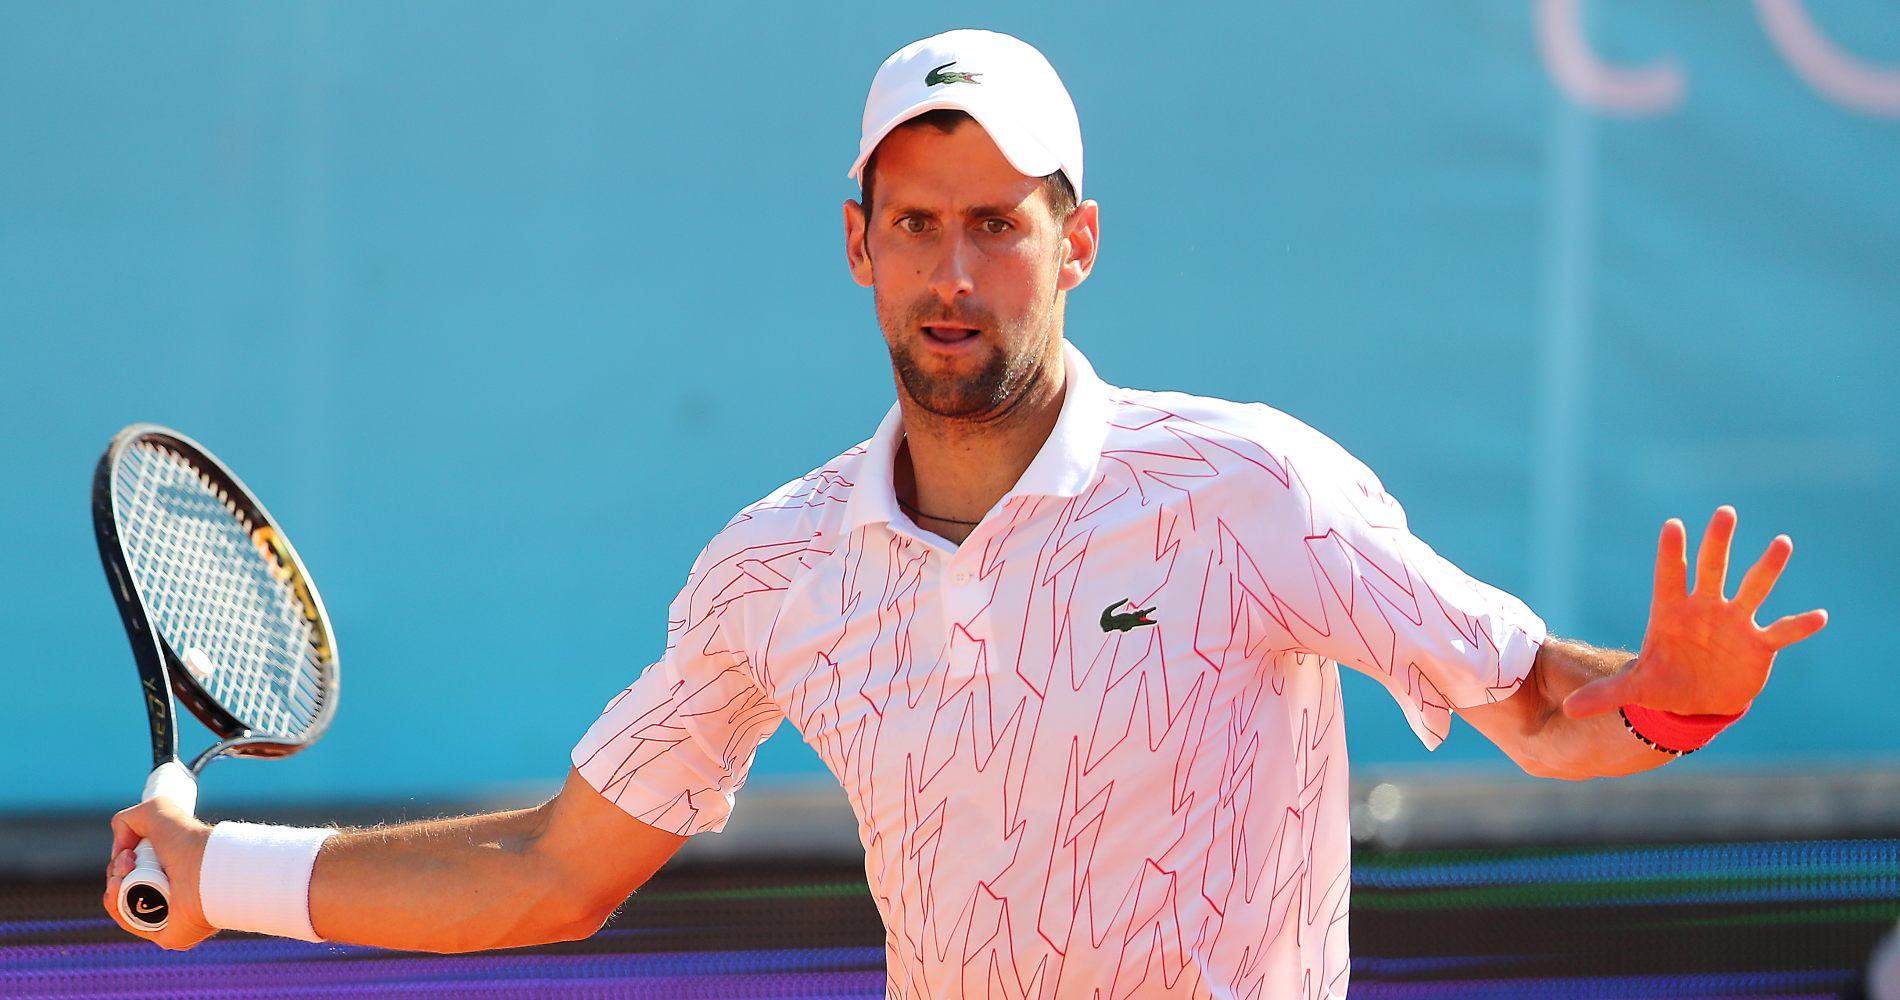 Novak Djokovic, Adria Tour, 2020